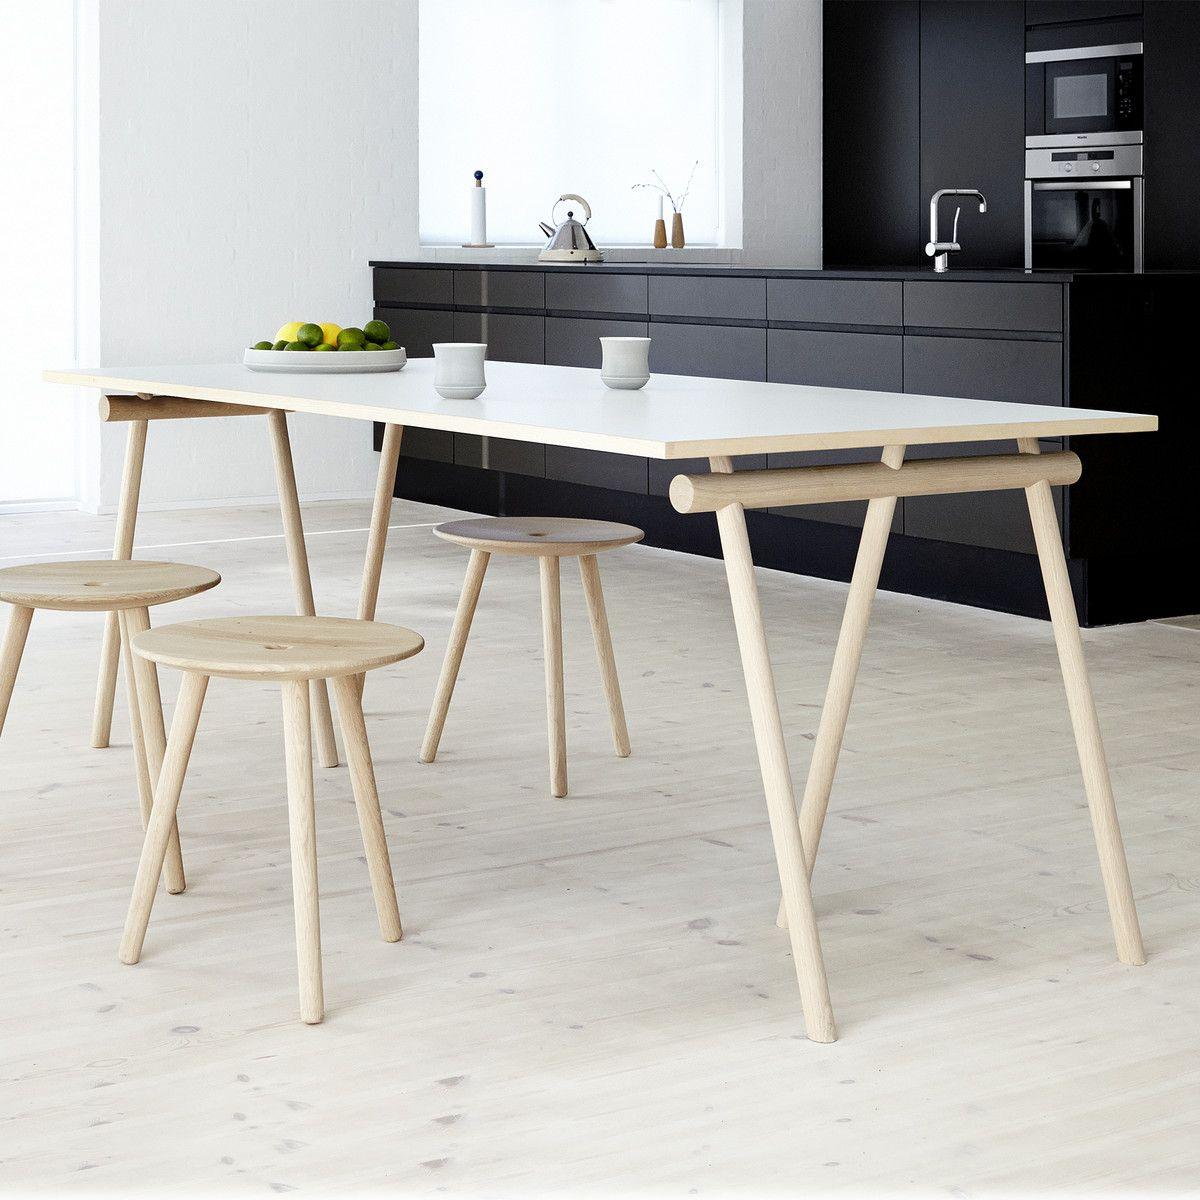 applicata stick trestle tischb cke 2er set eiche. Black Bedroom Furniture Sets. Home Design Ideas